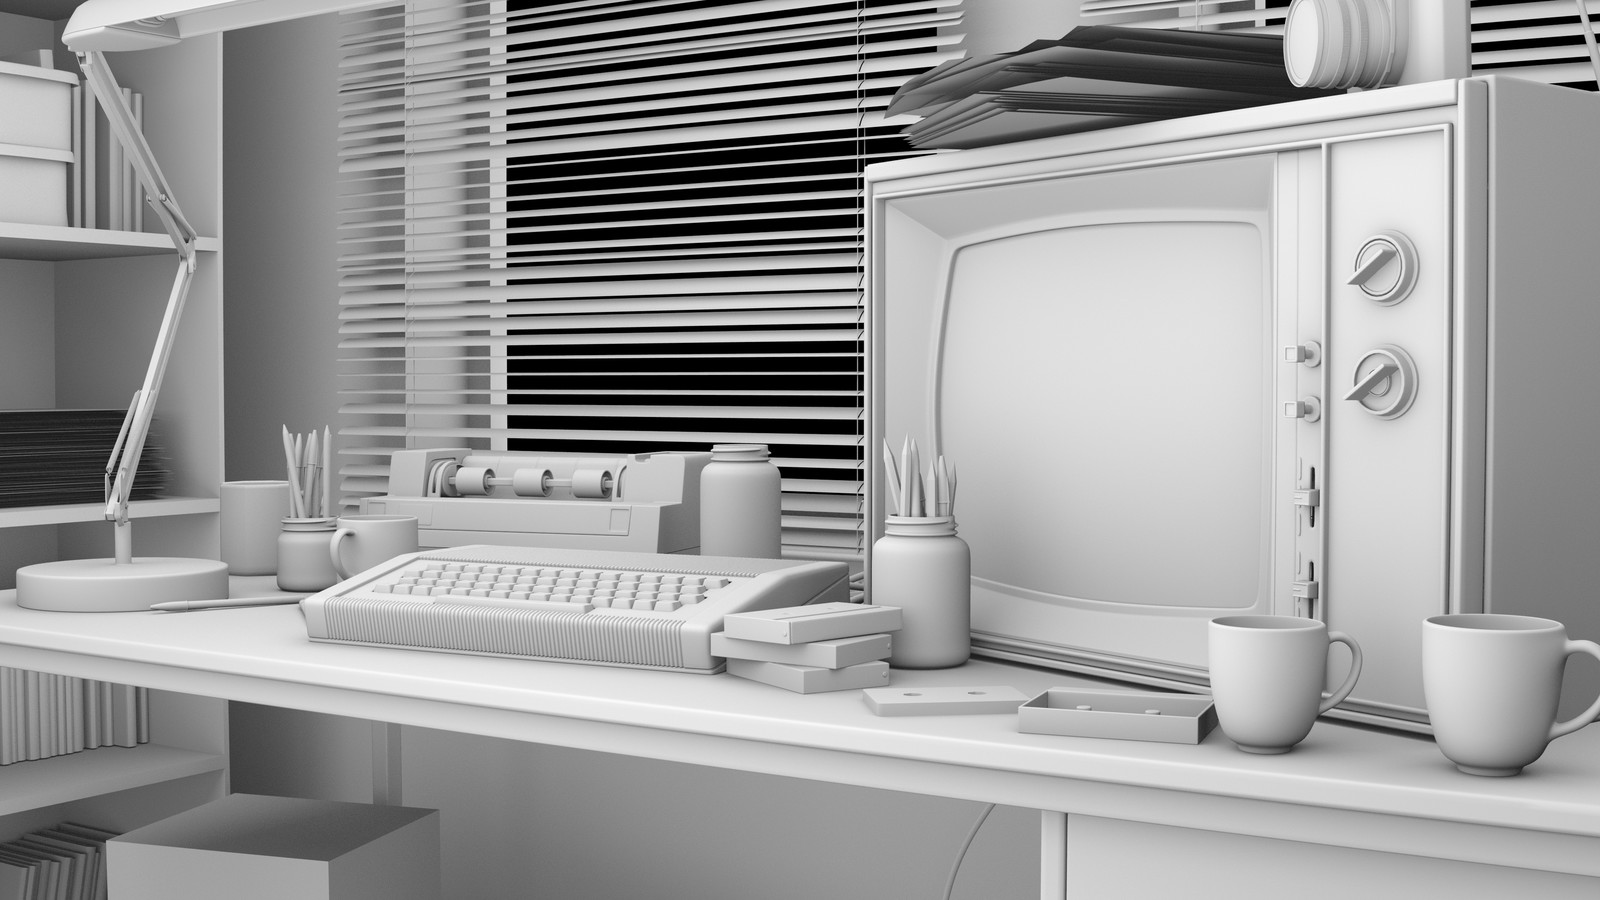 WIP - 'Birthday' film: 1980's Bedroom Environment